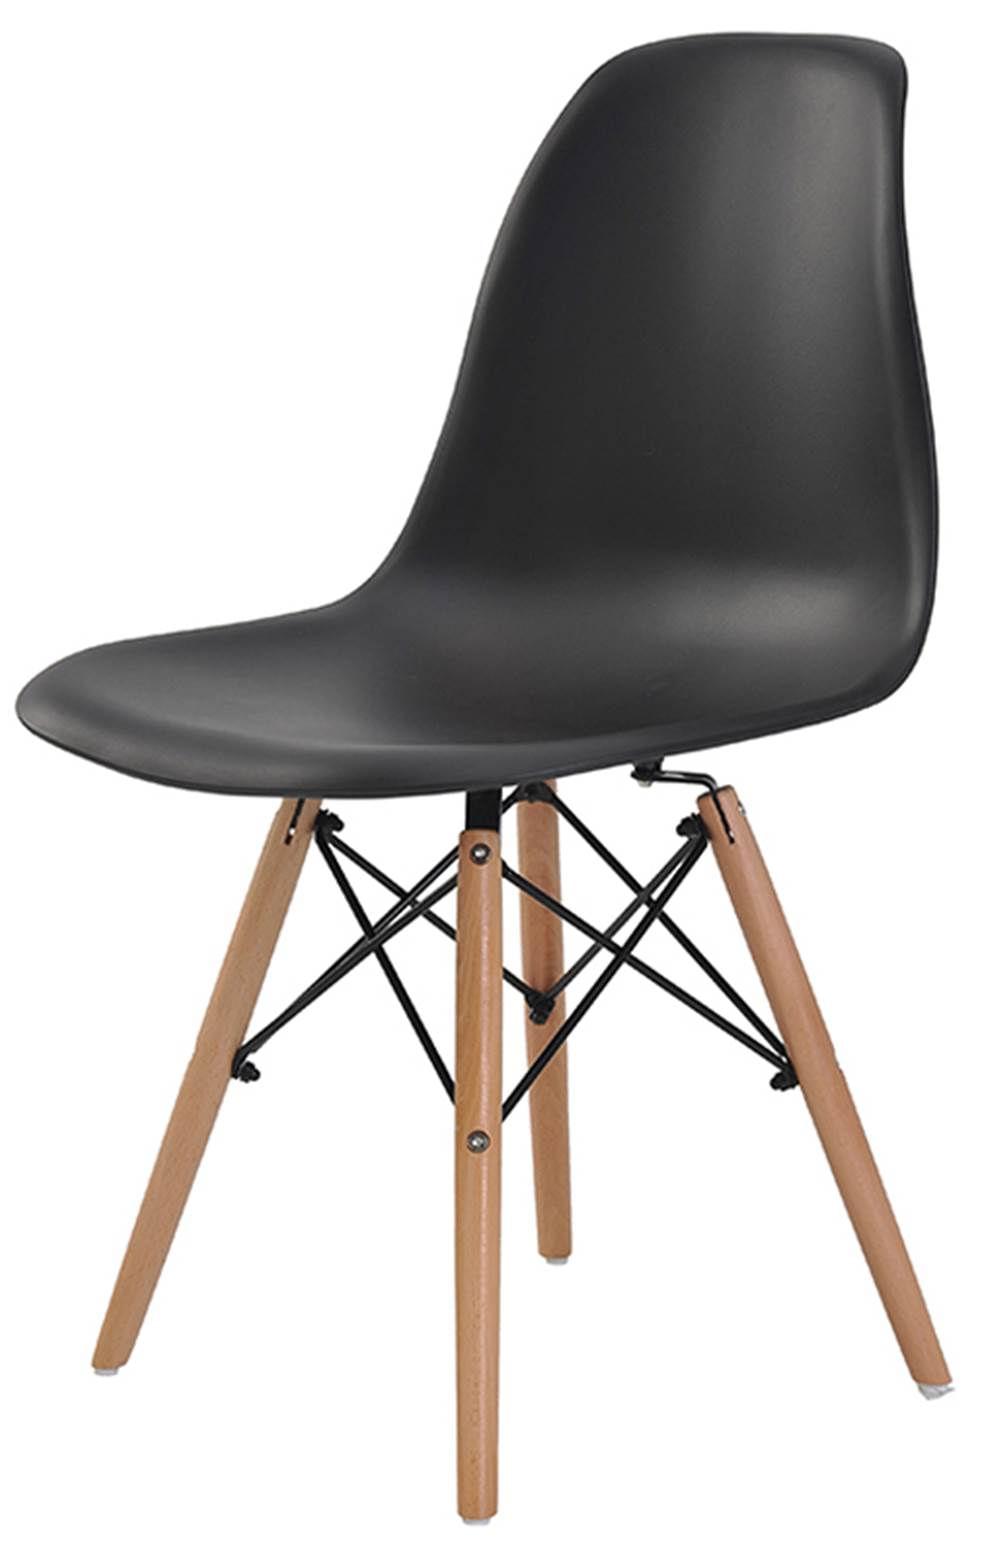 Cadeira Eames Eiffel Polipropileno Preto Base Madeira - 44161